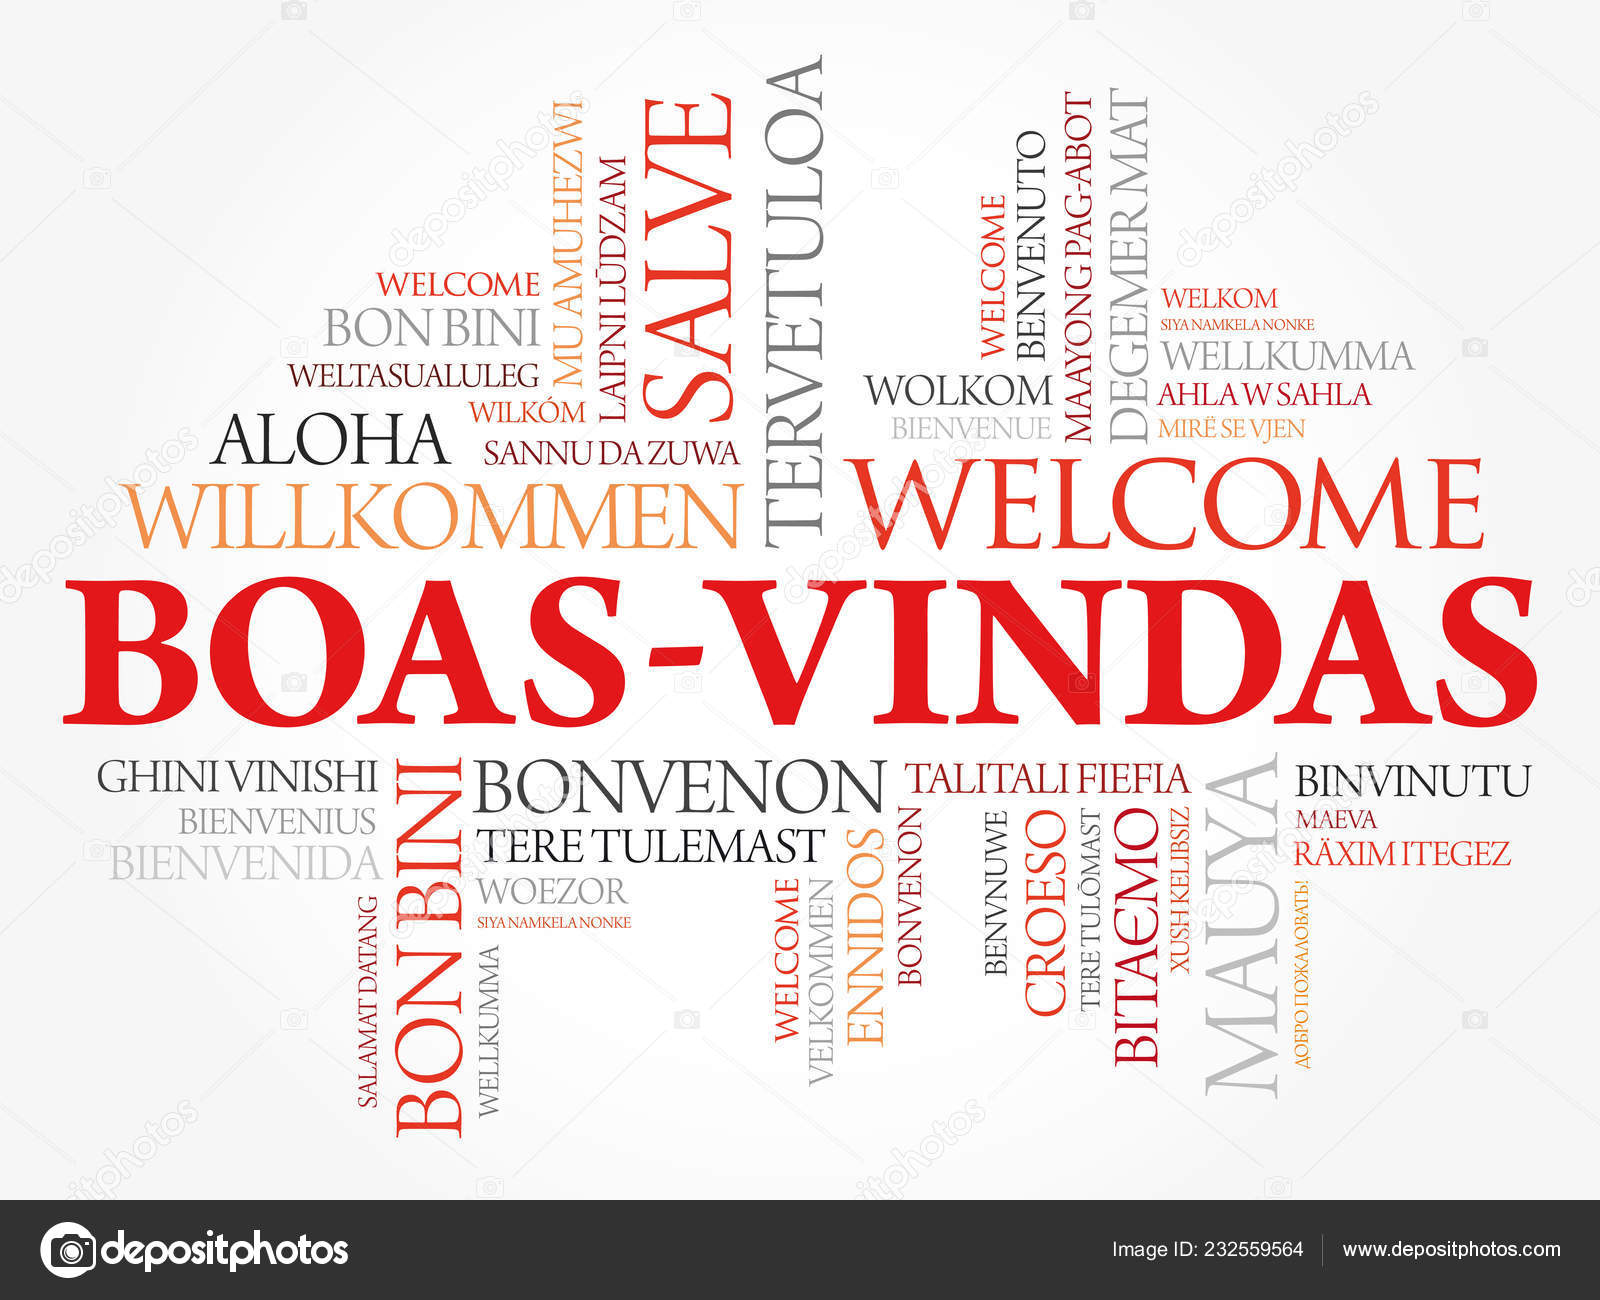 Boas Vindas Welcome Brazilian Portuguese Word Cloud Different Languages Conceptual Stock Vector C Dizanna 232559564